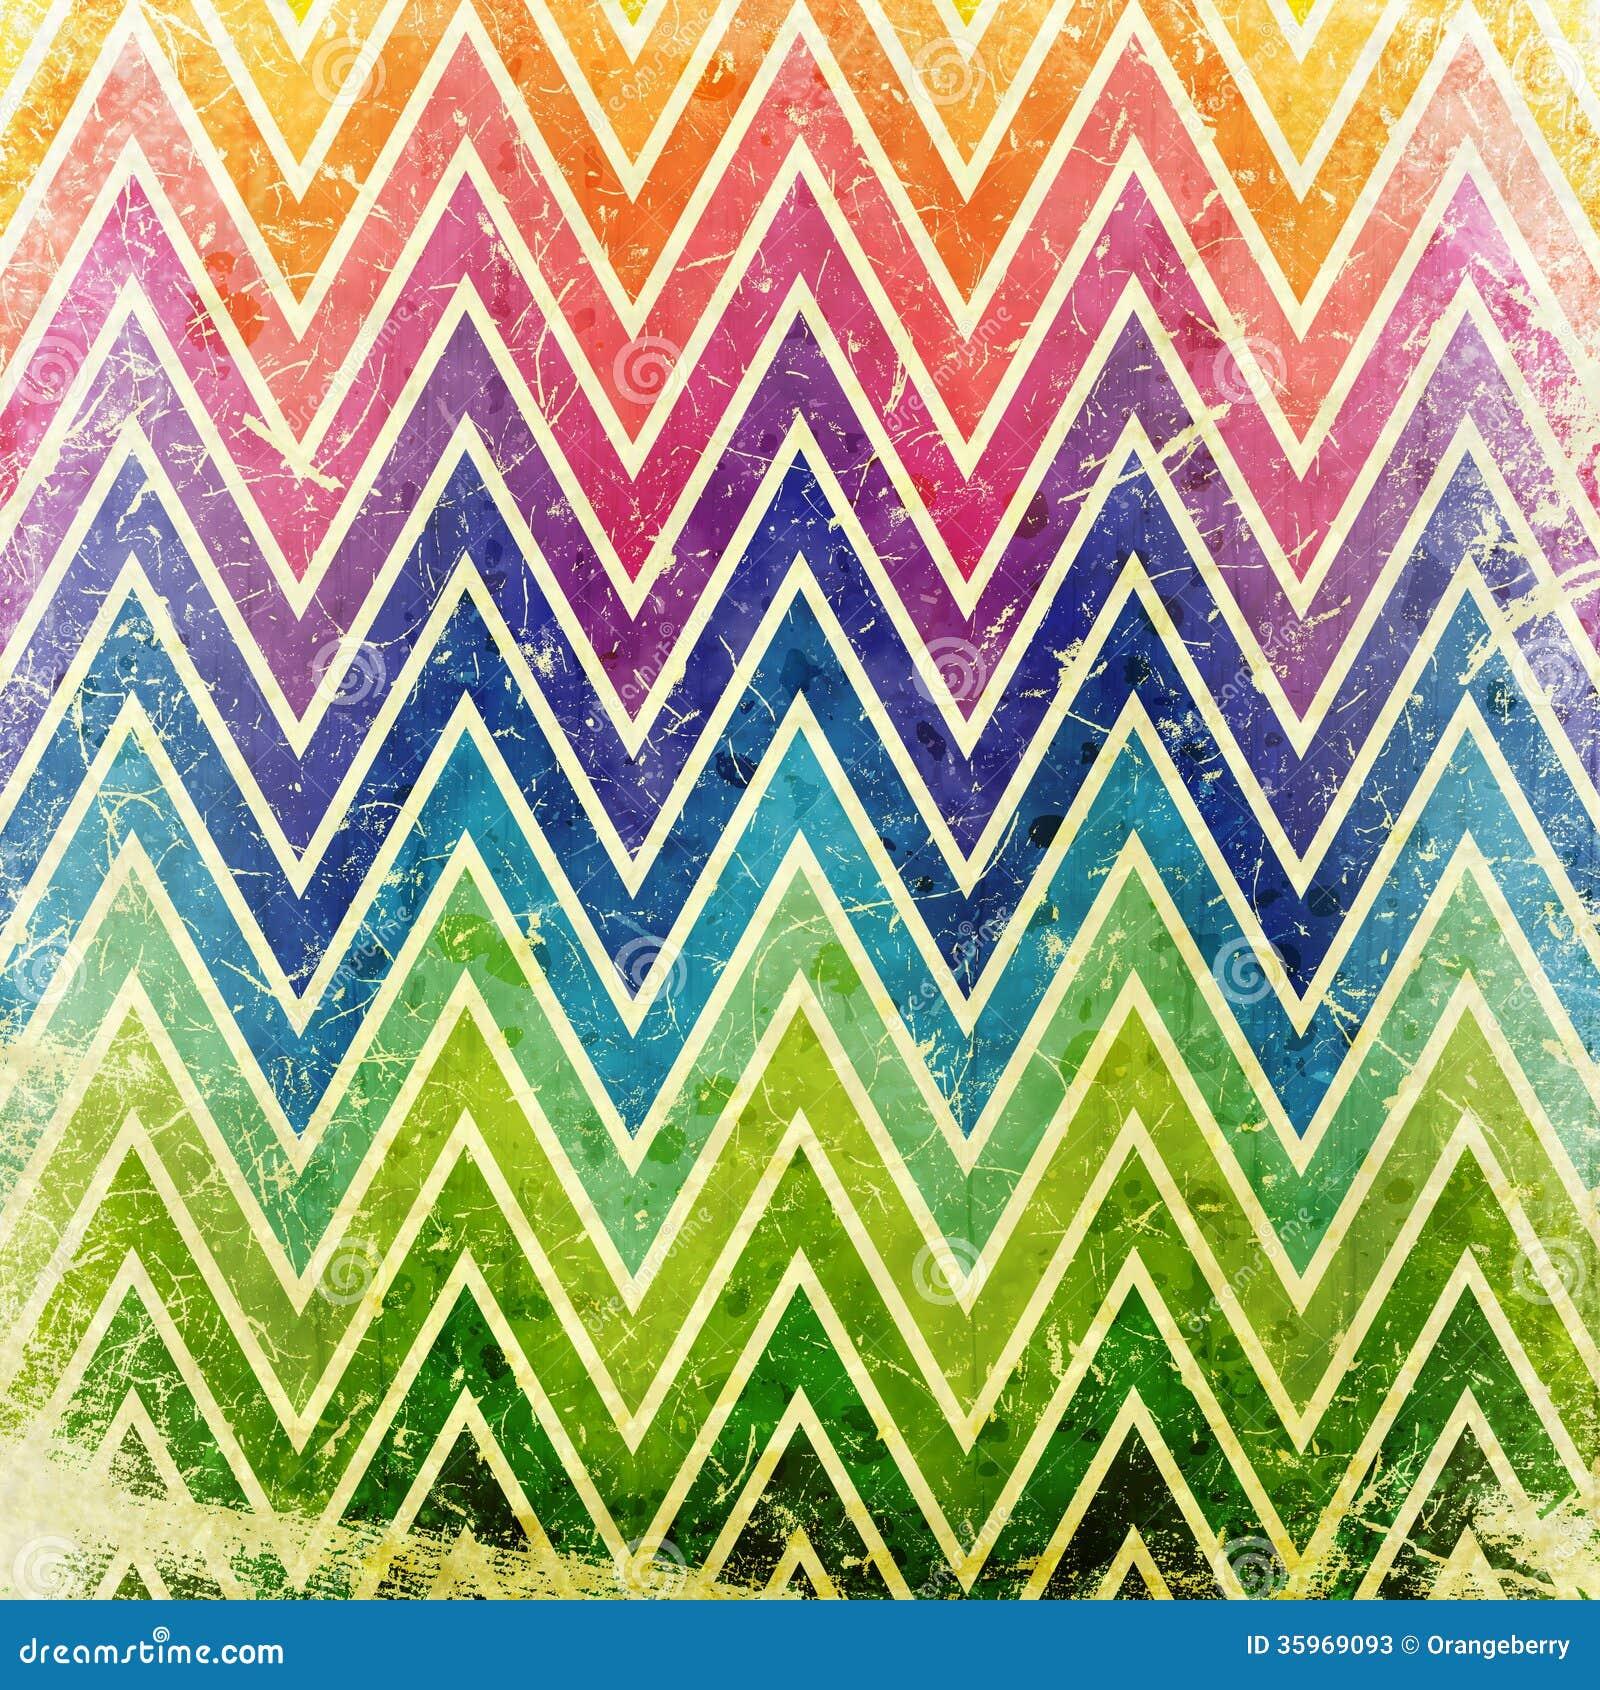 grunge background with zigzag pattern stock image image of blotchy colorful 35969093. Black Bedroom Furniture Sets. Home Design Ideas